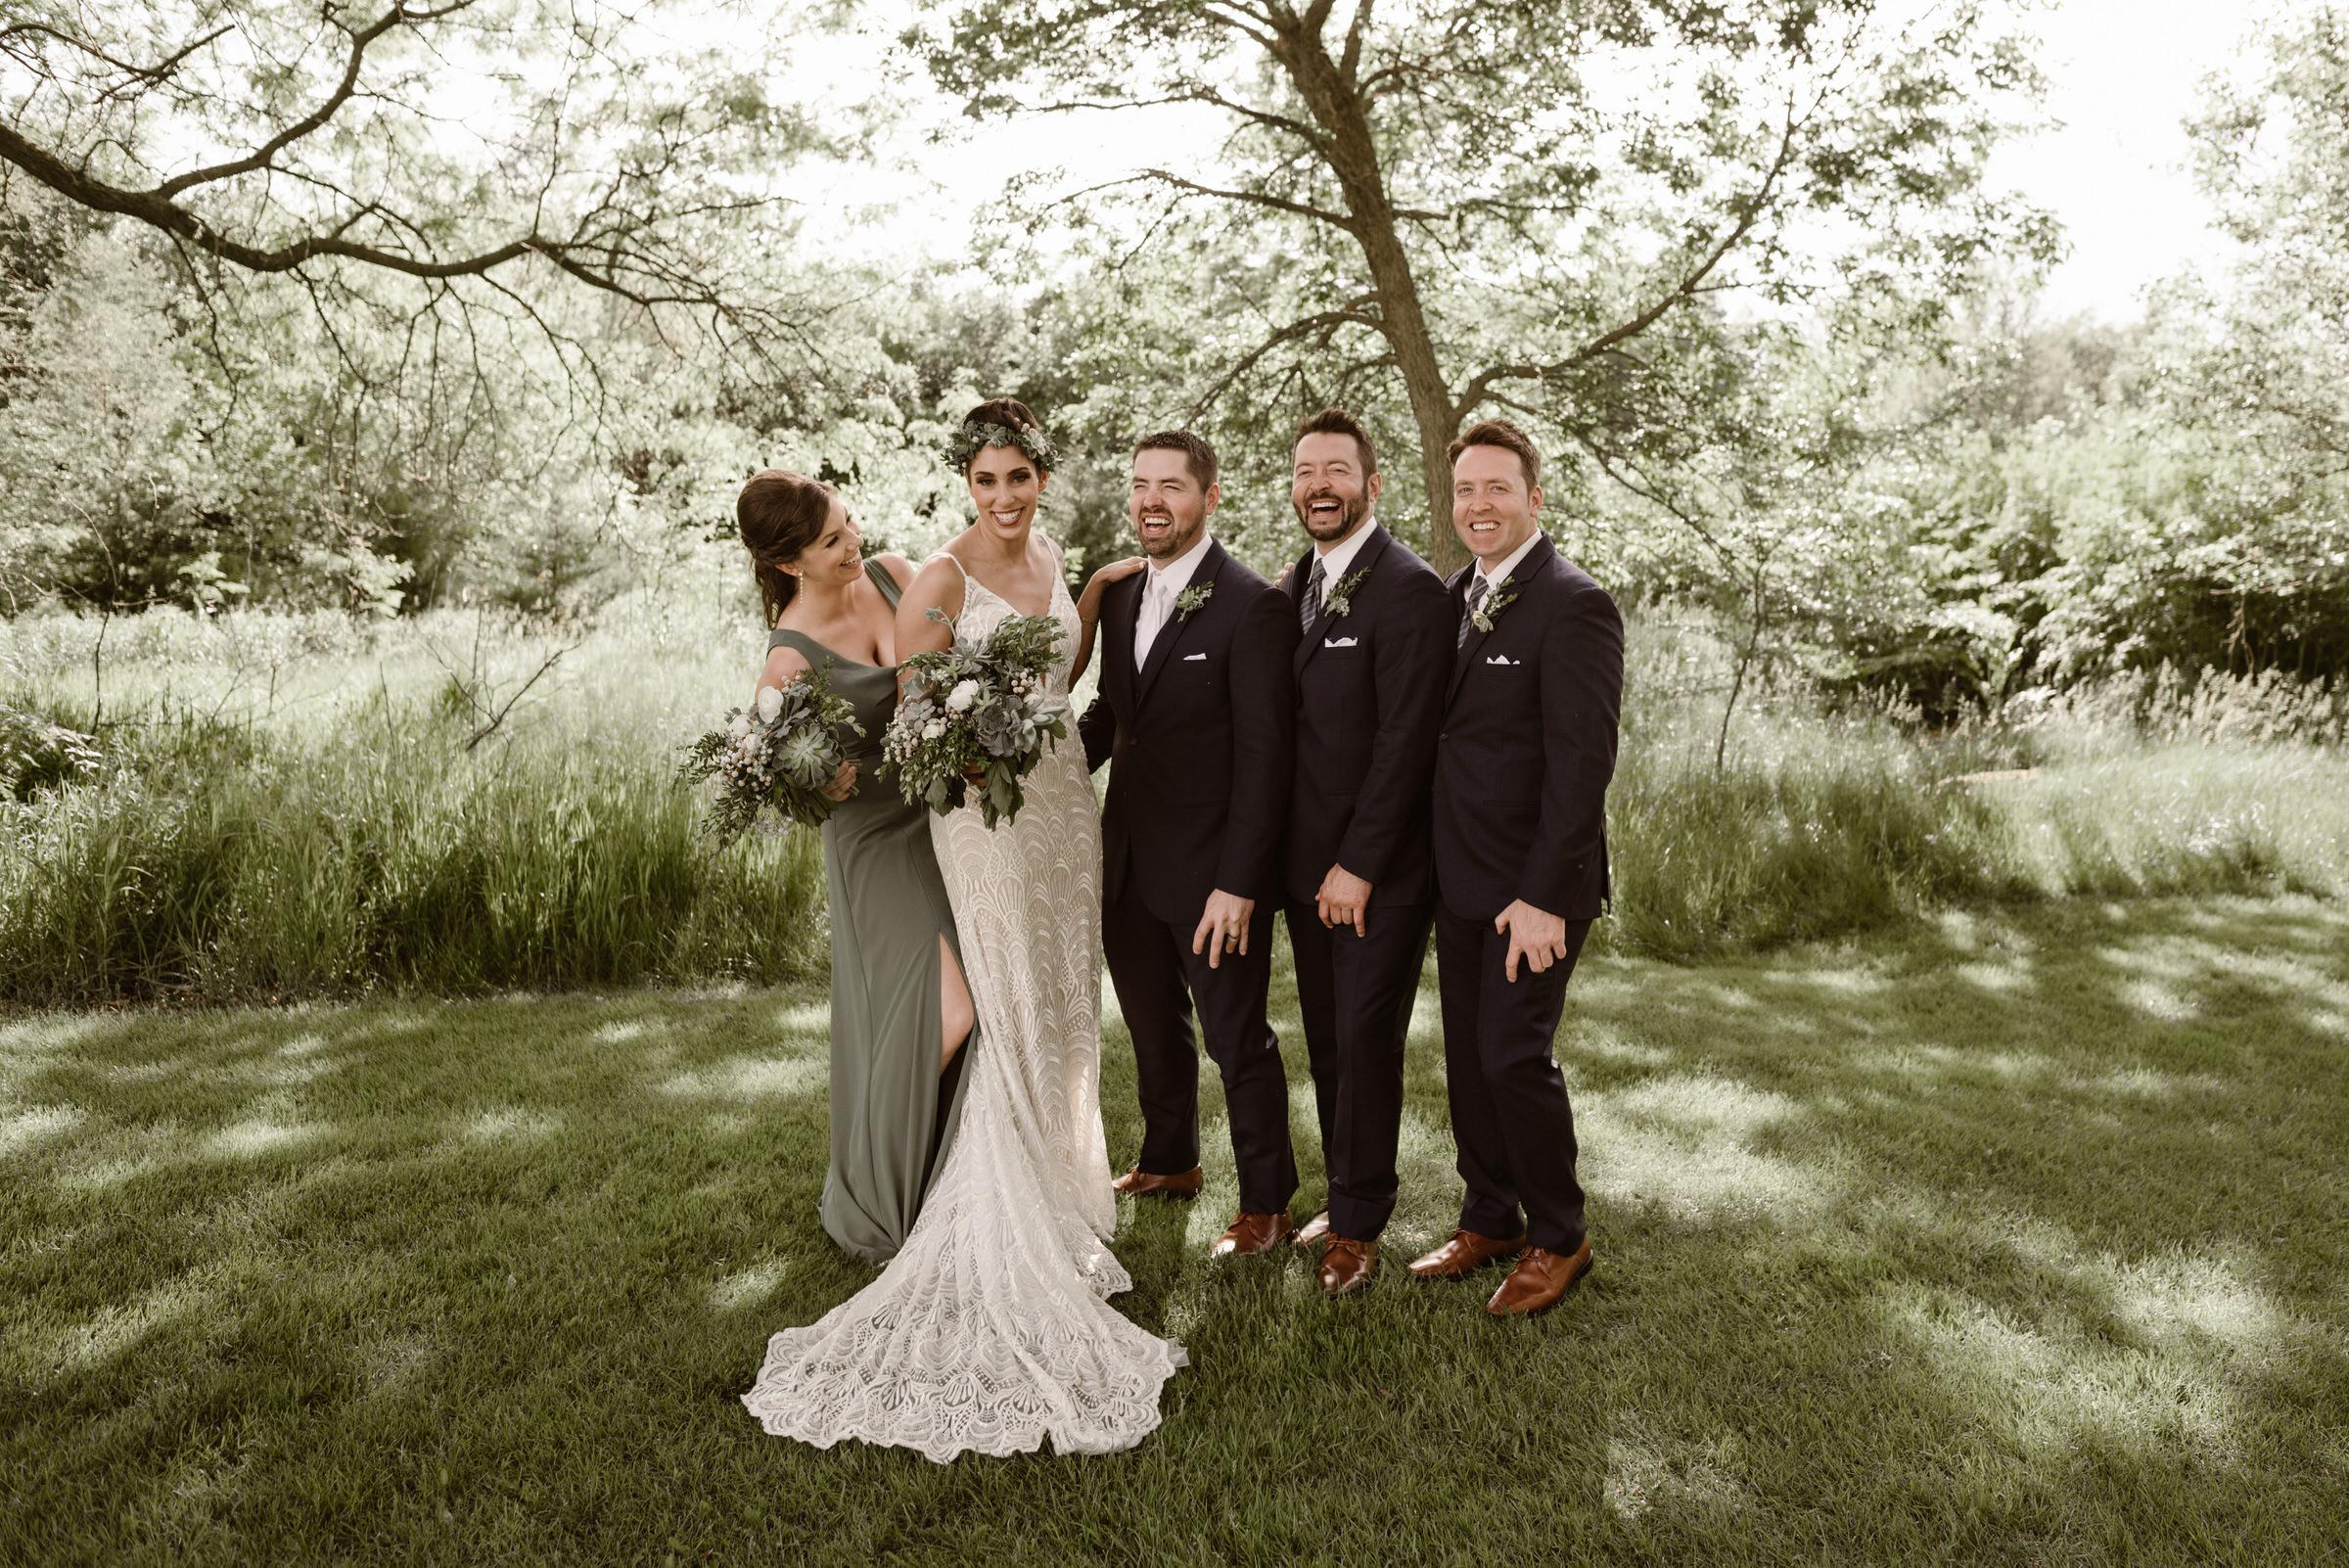 Wilderness-Ridge-Lincoln-Nebraska-Wedding-Kaylie-Sirek-Photography-069.jpg